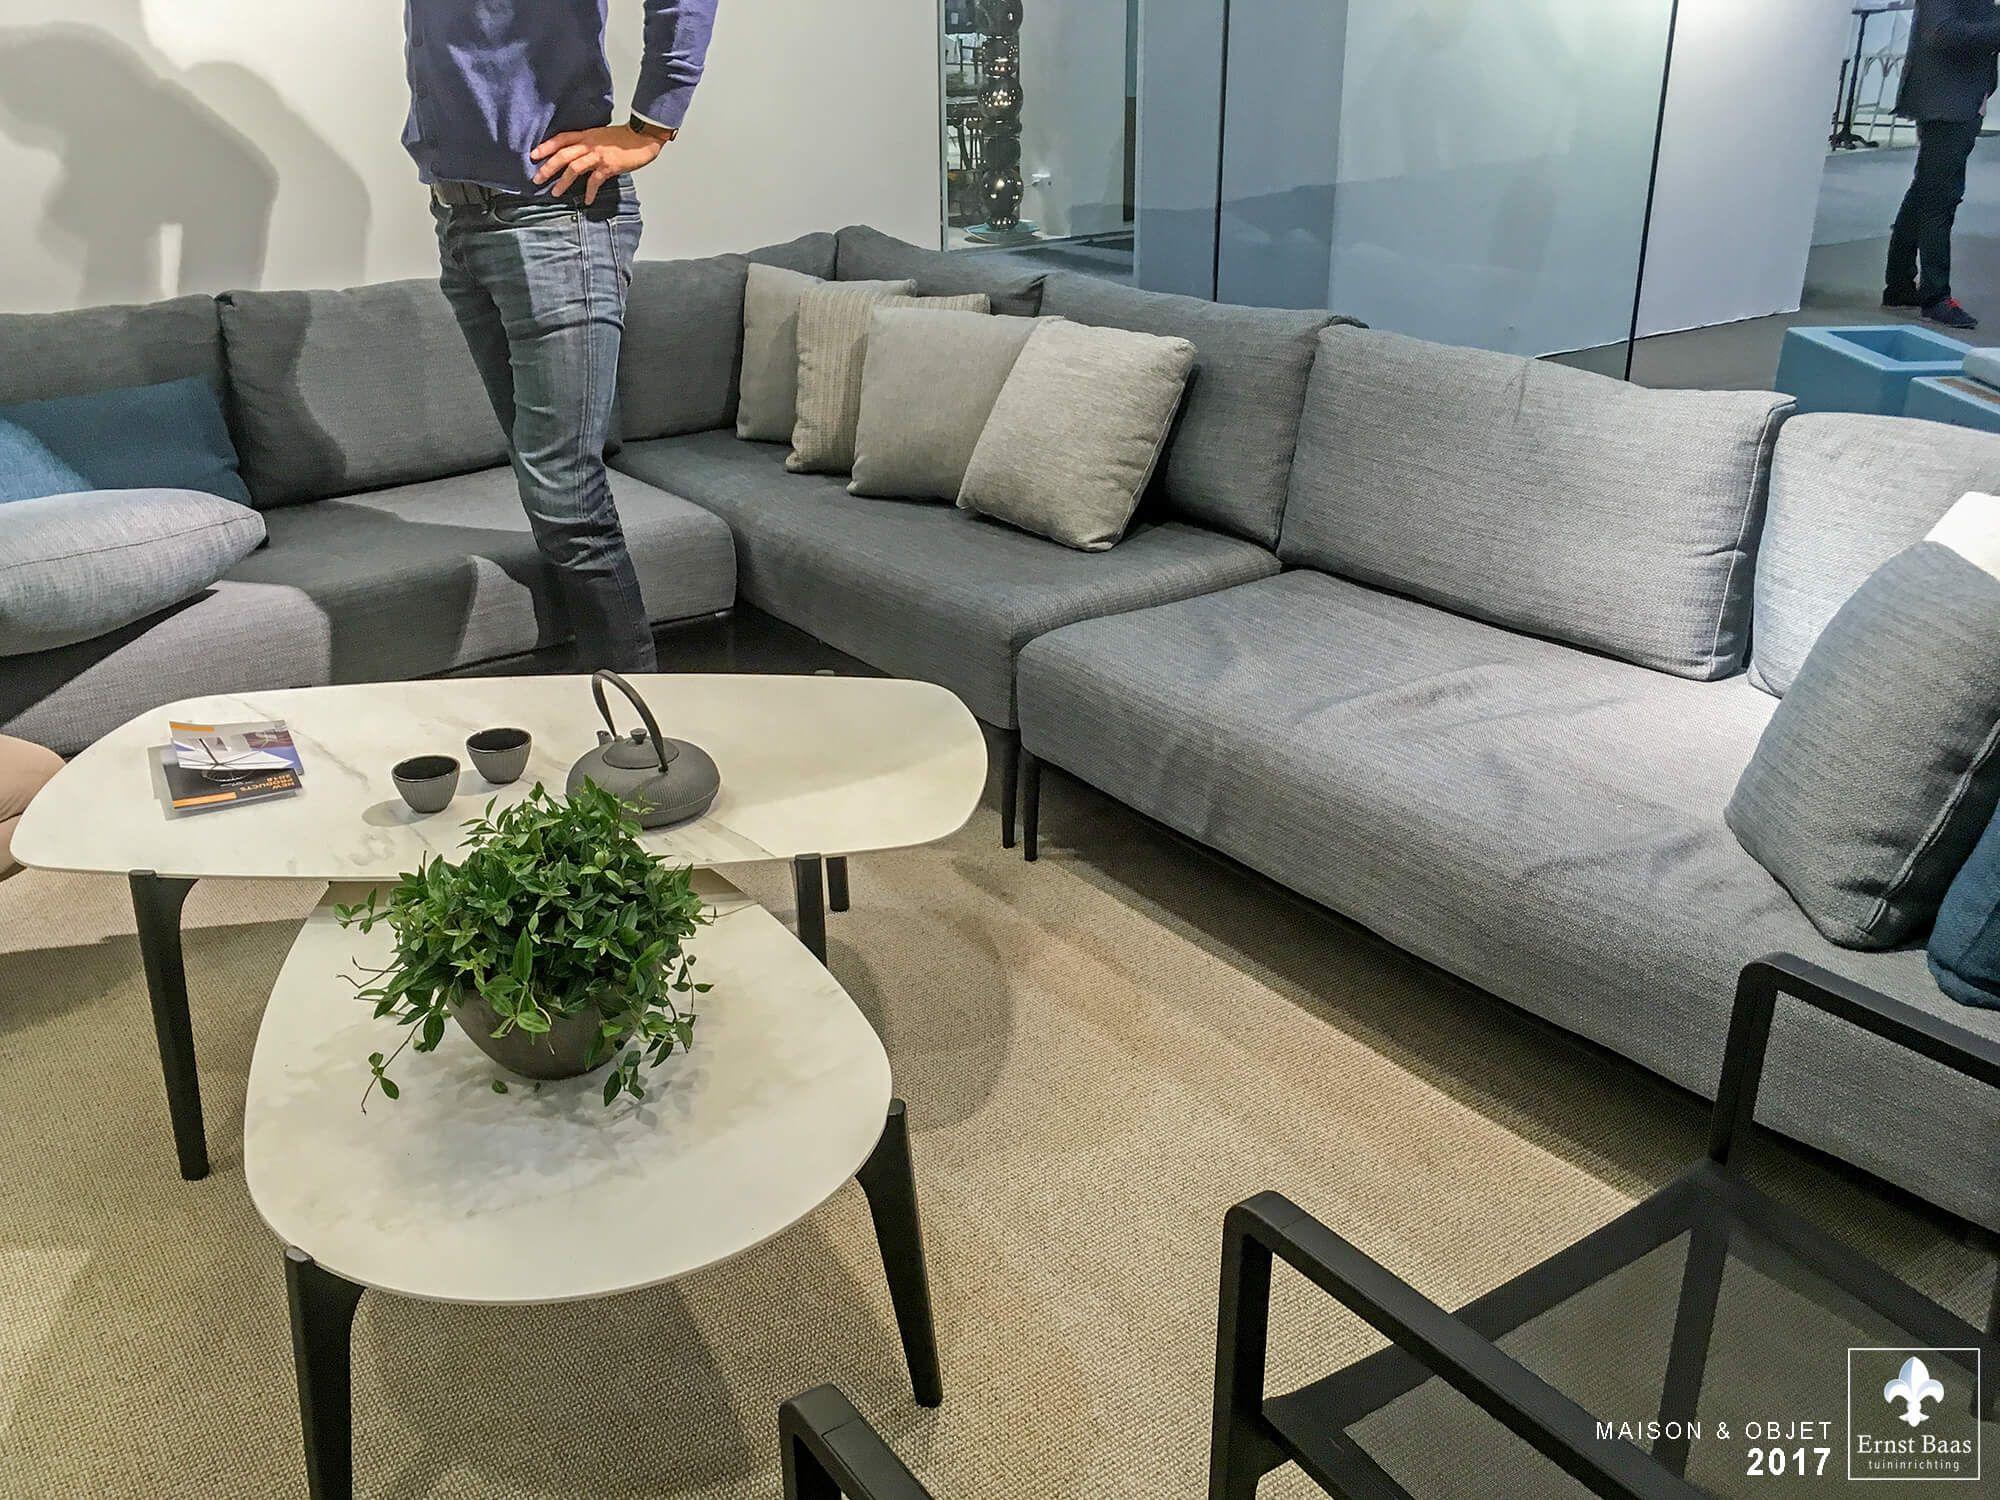 Royal botania lounge 2018 tuinmeubels pinterest royal botania